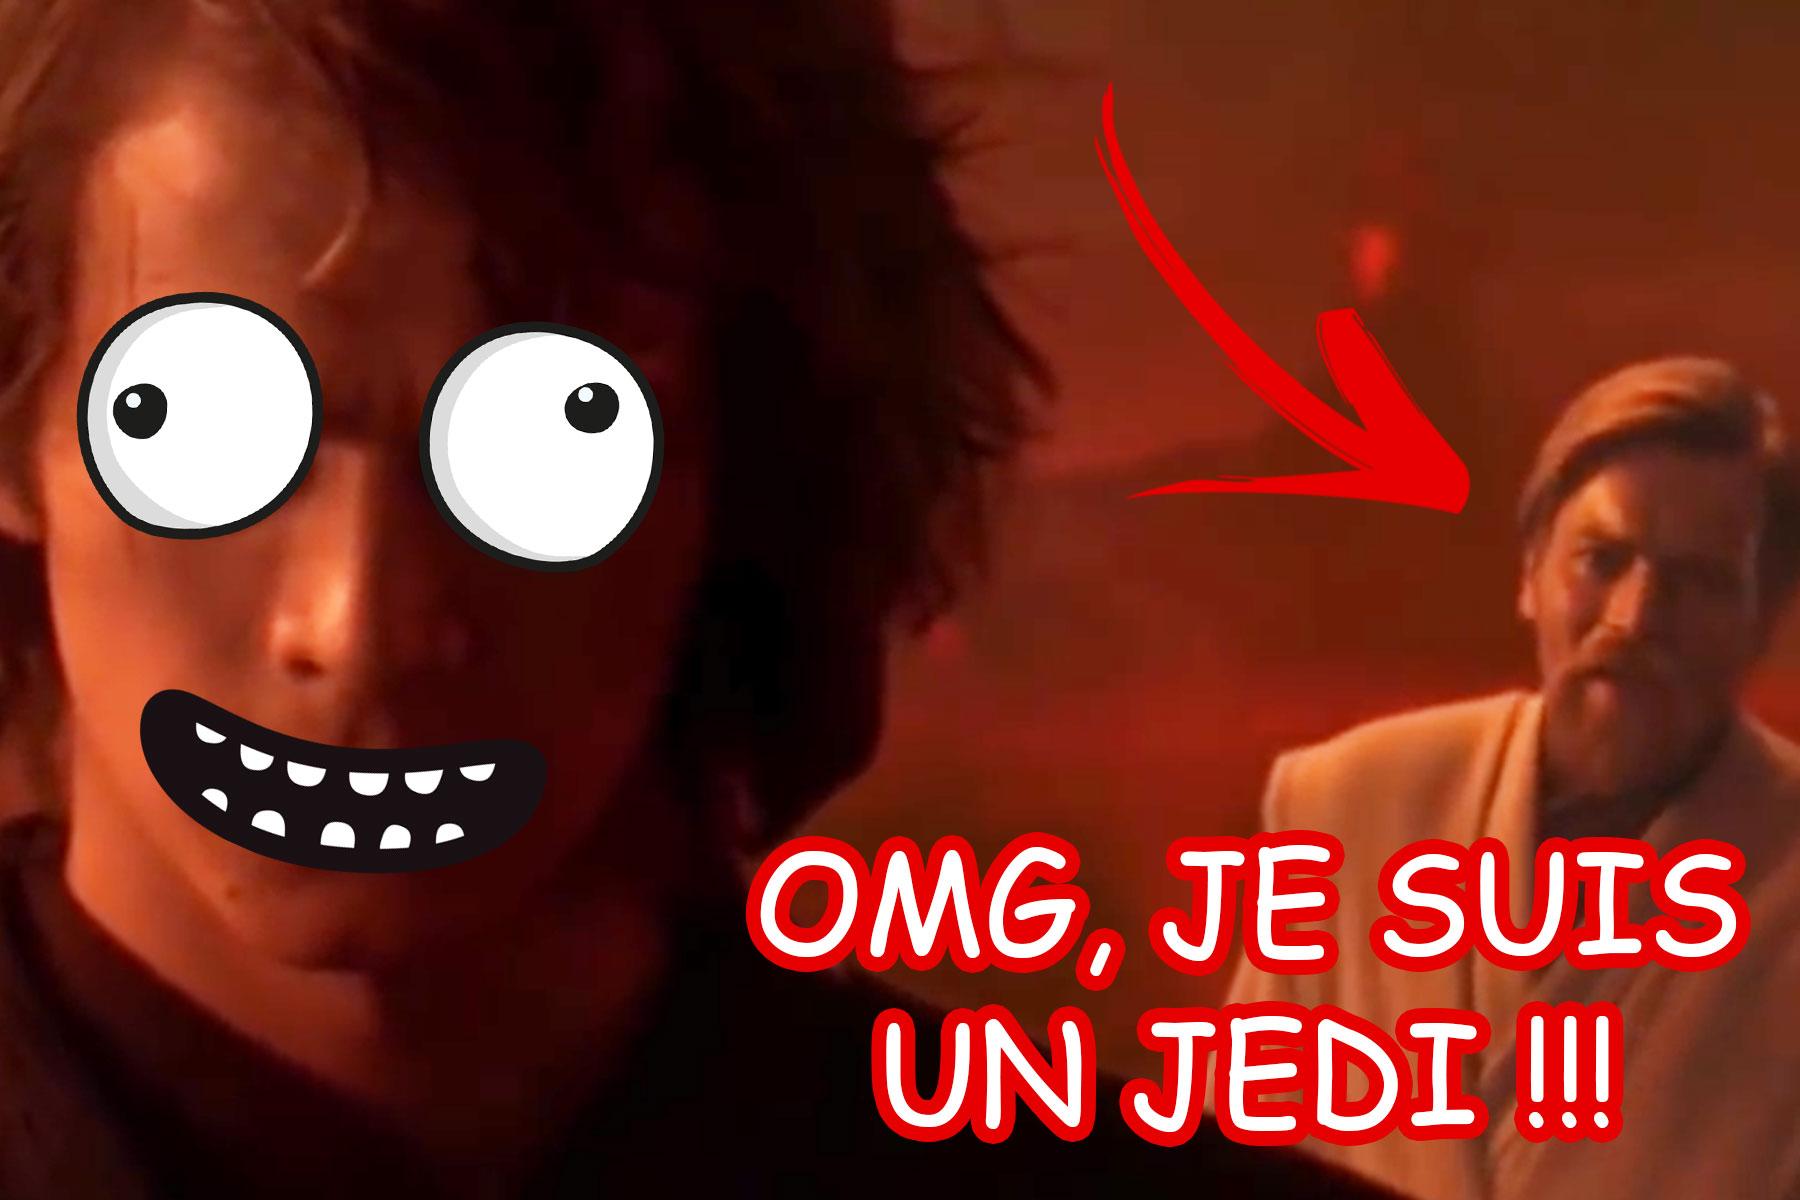 Note #14 : Je suis un Jedi, ça tourne mal !!! xD LOL